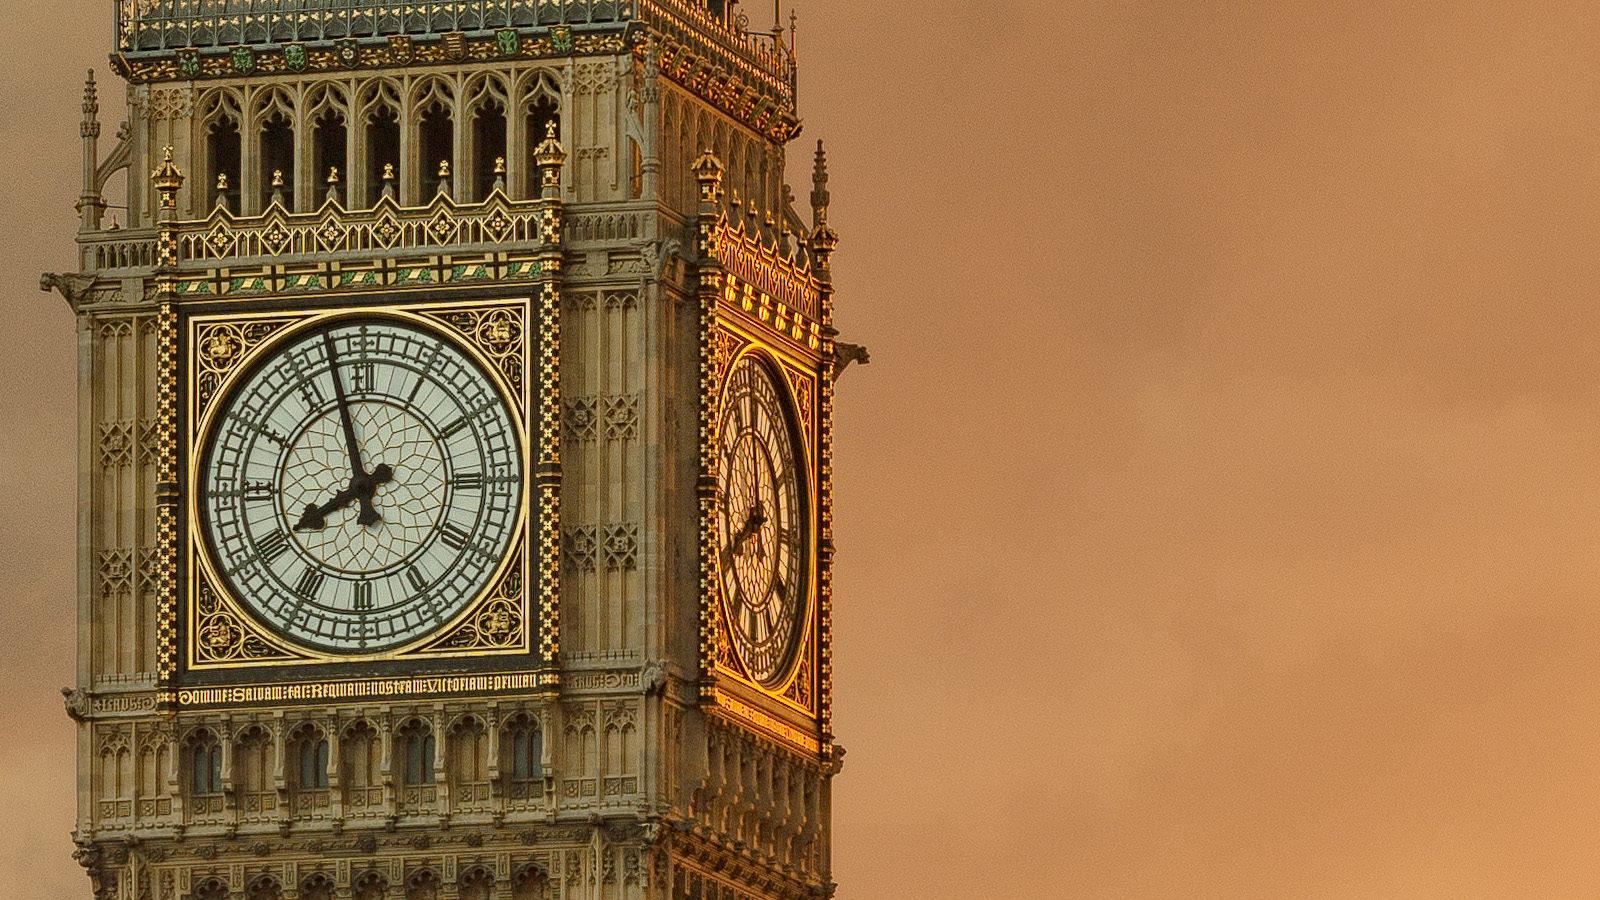 Palace Of Westminster Detail - Close up of Big Ben. London Fine Art Print.